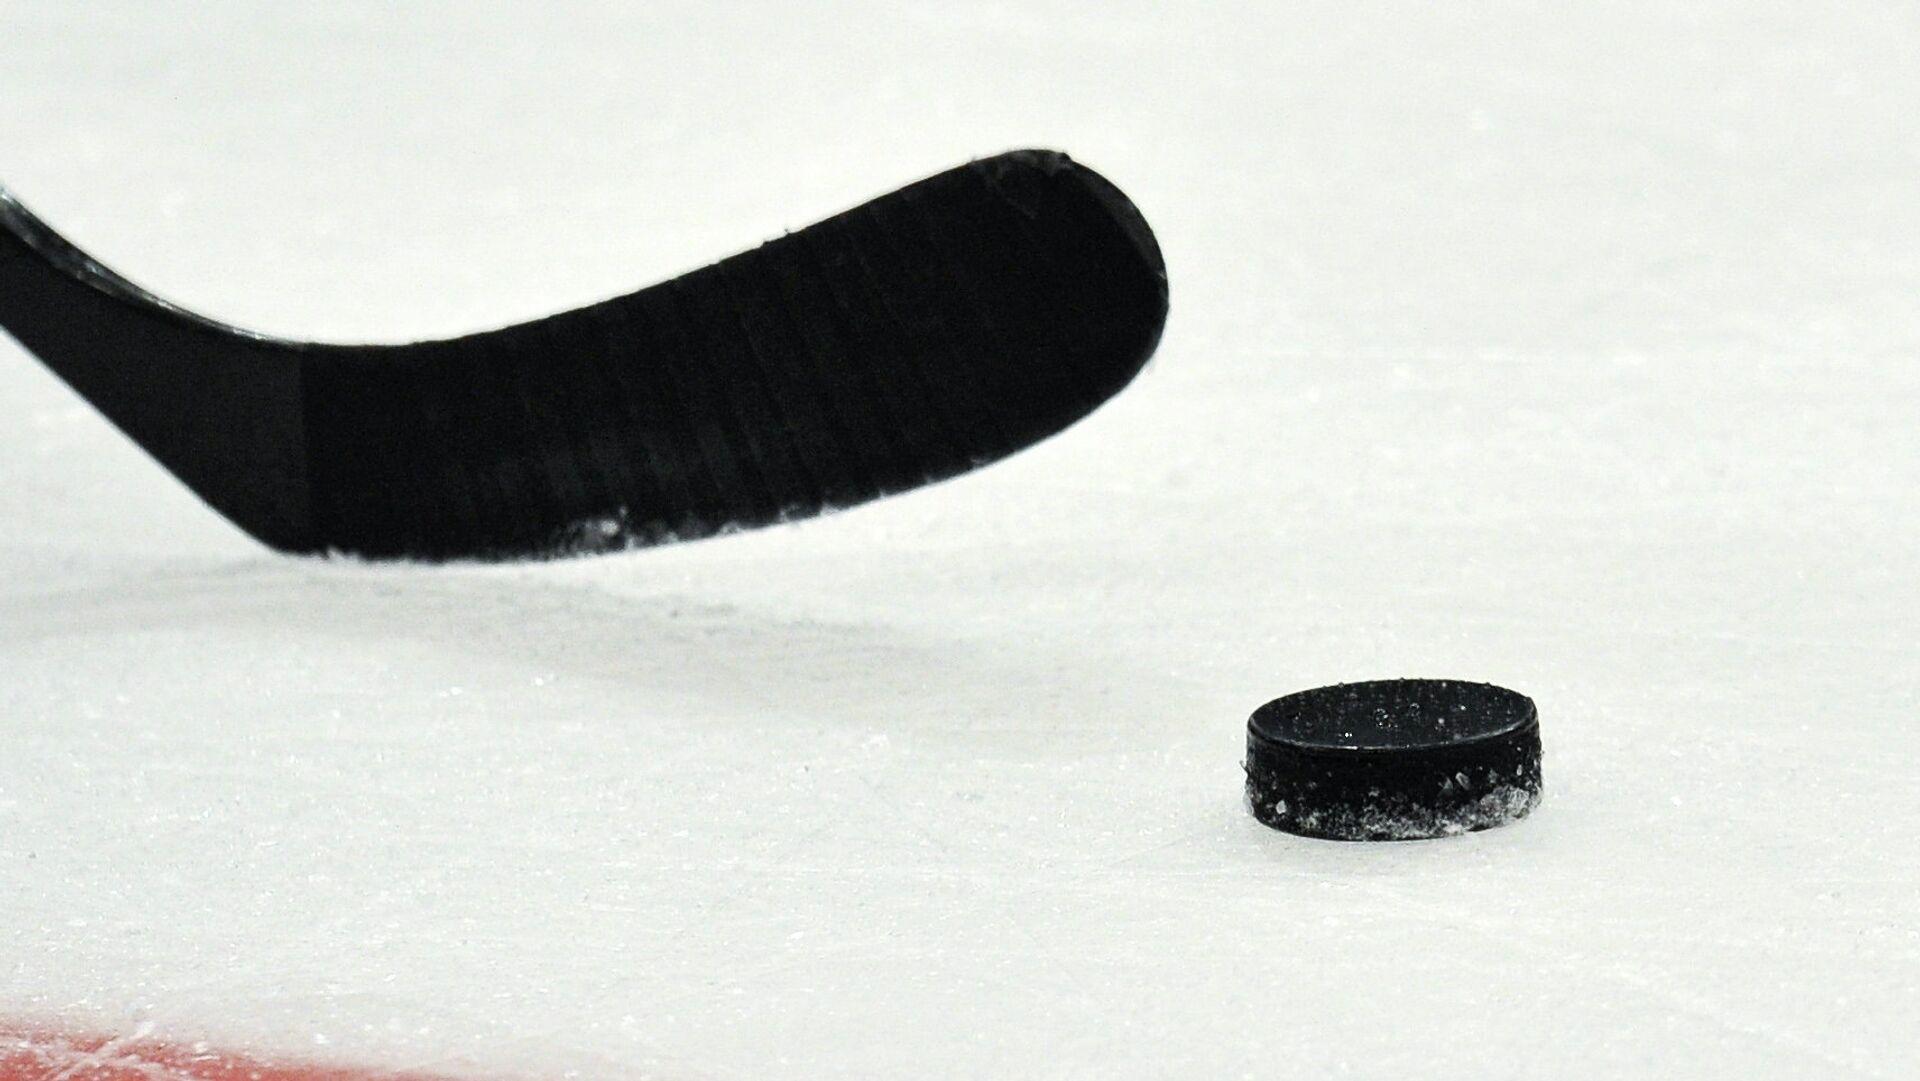 Хоккей - РИА Новости, 1920, 20.02.2021